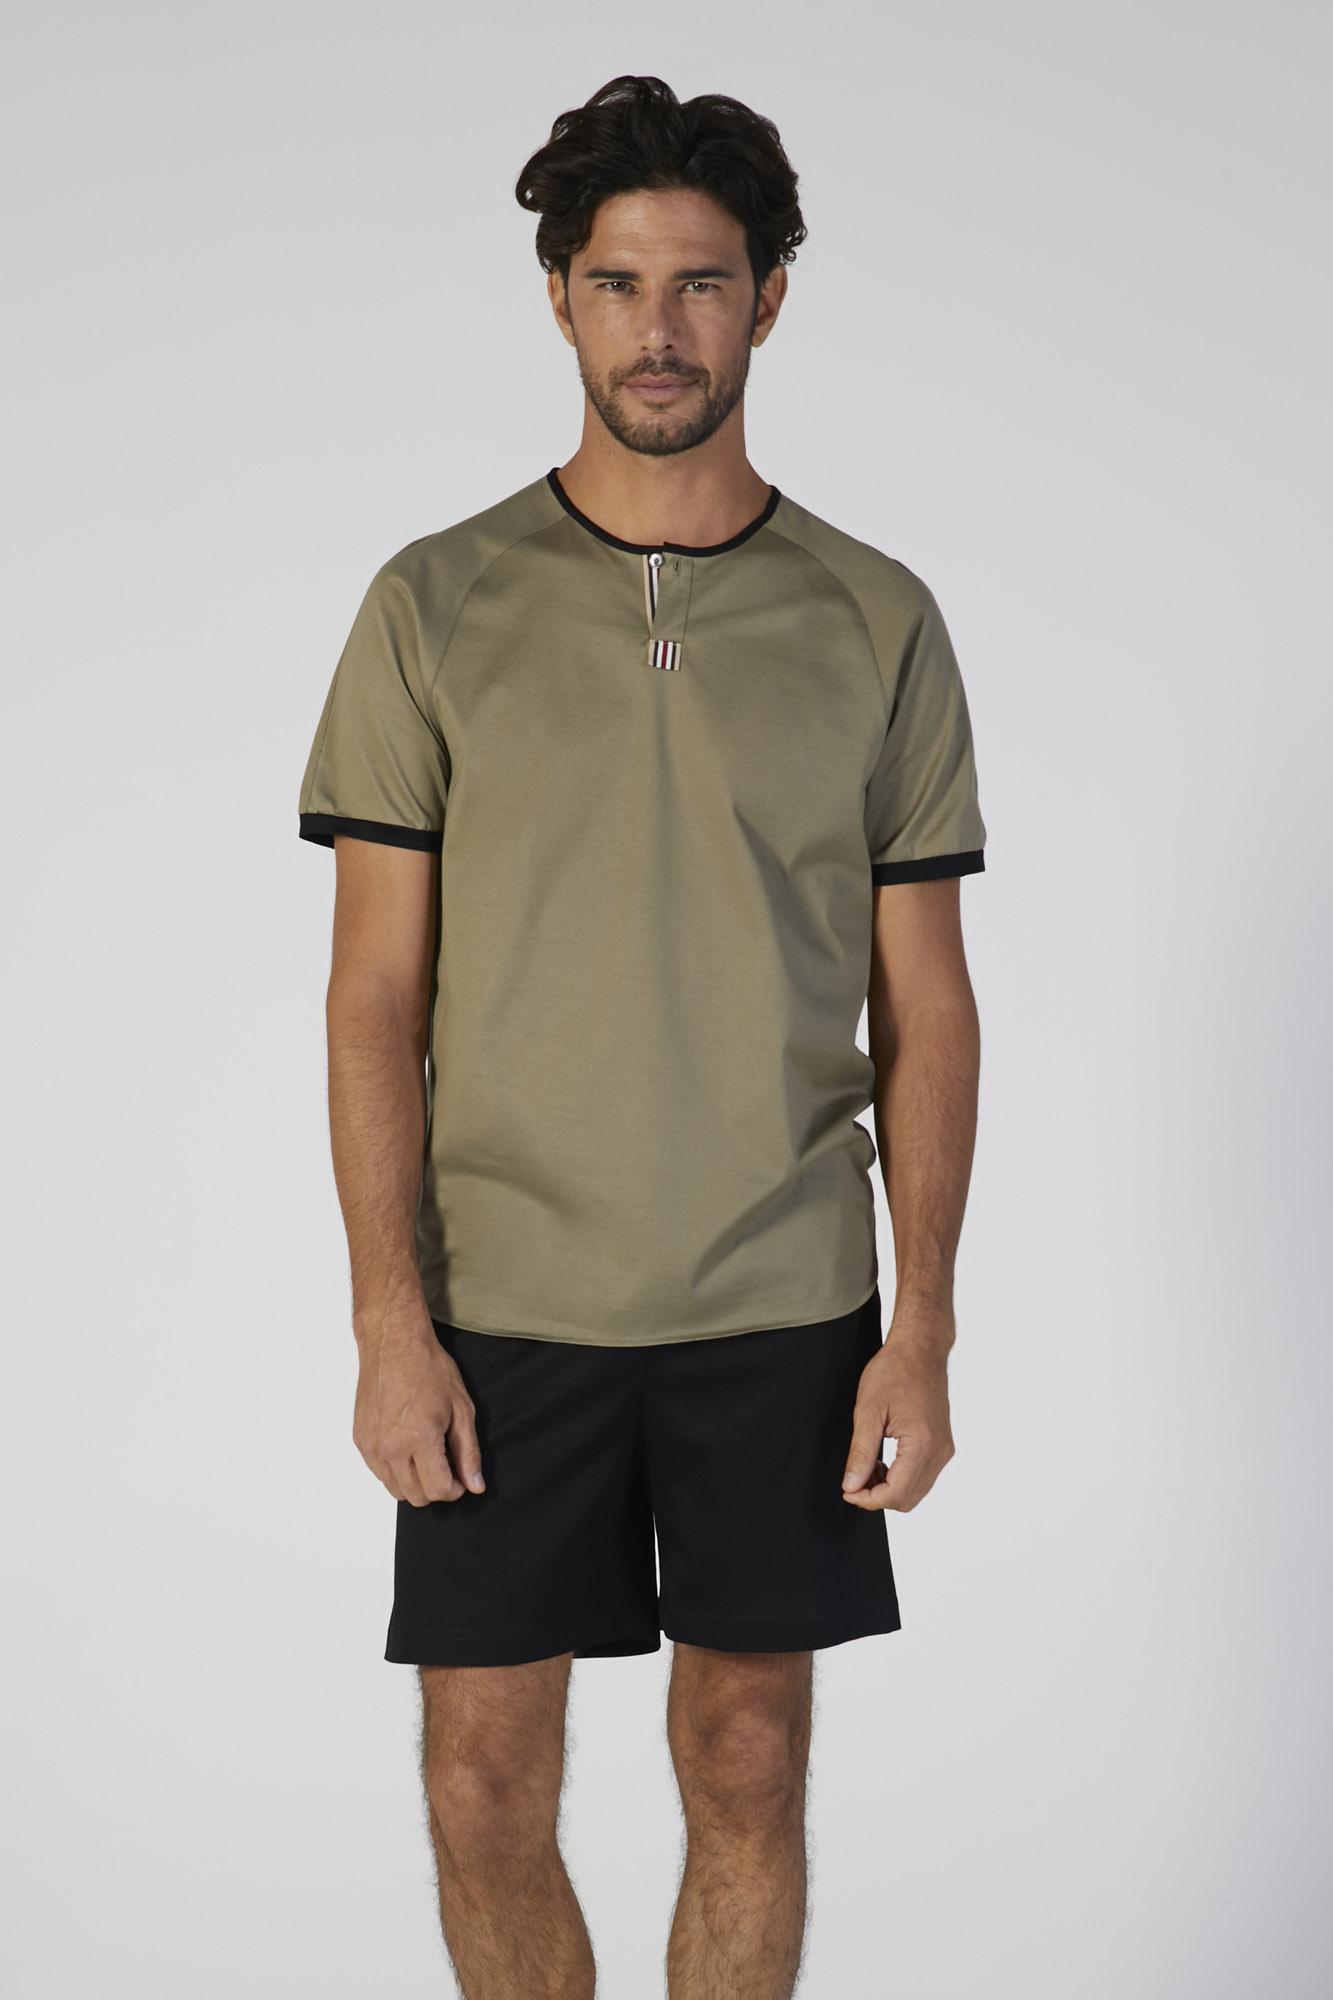 pigiama jersey cotone manica corta verdiani uomo